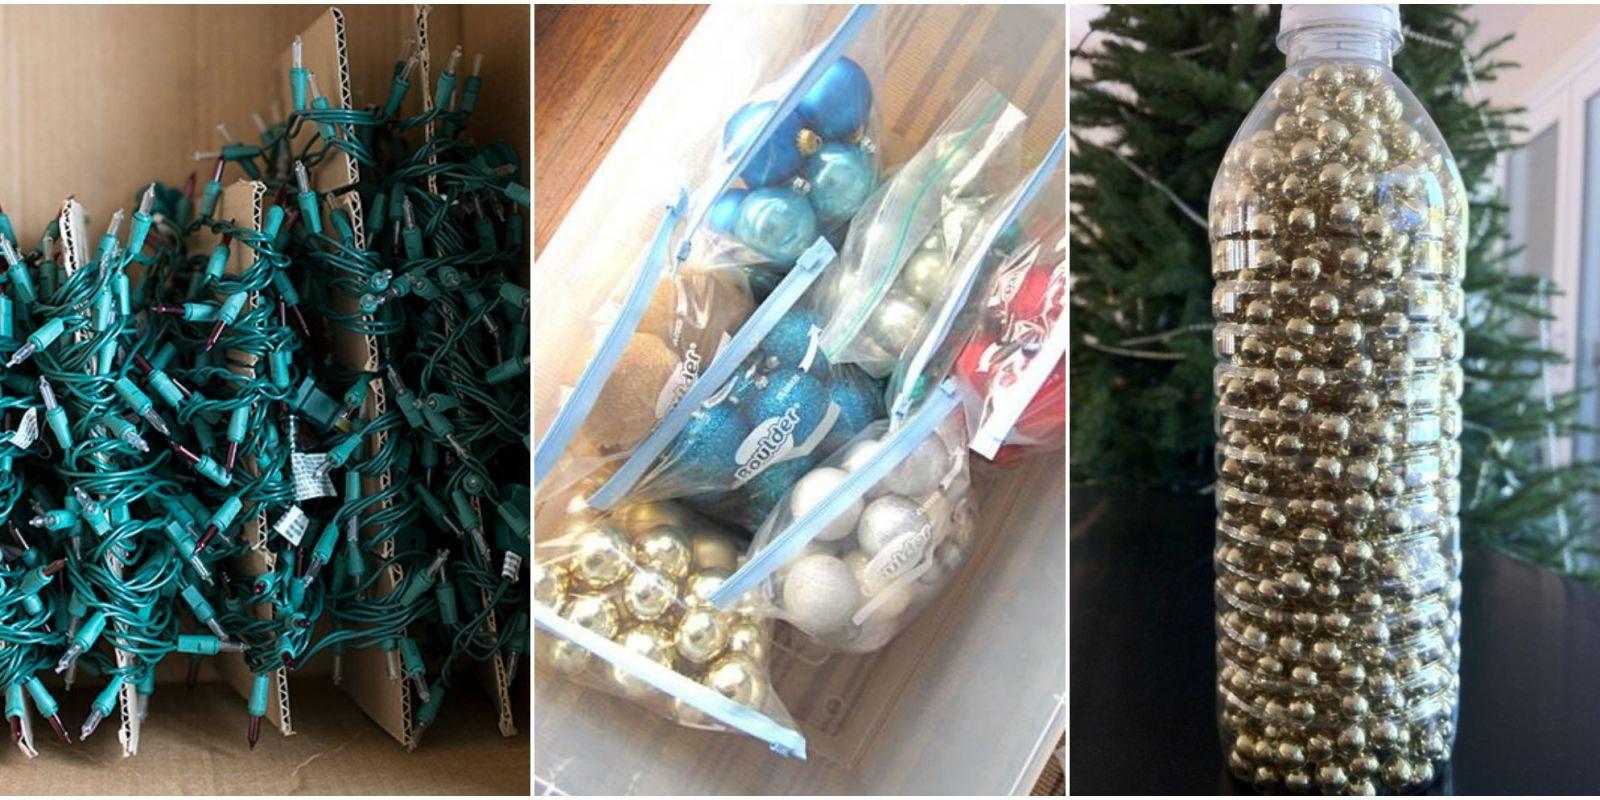 Christmas Decoration Storage Ideas  How To Store Fake Christmas Trees &  Holiday Decor